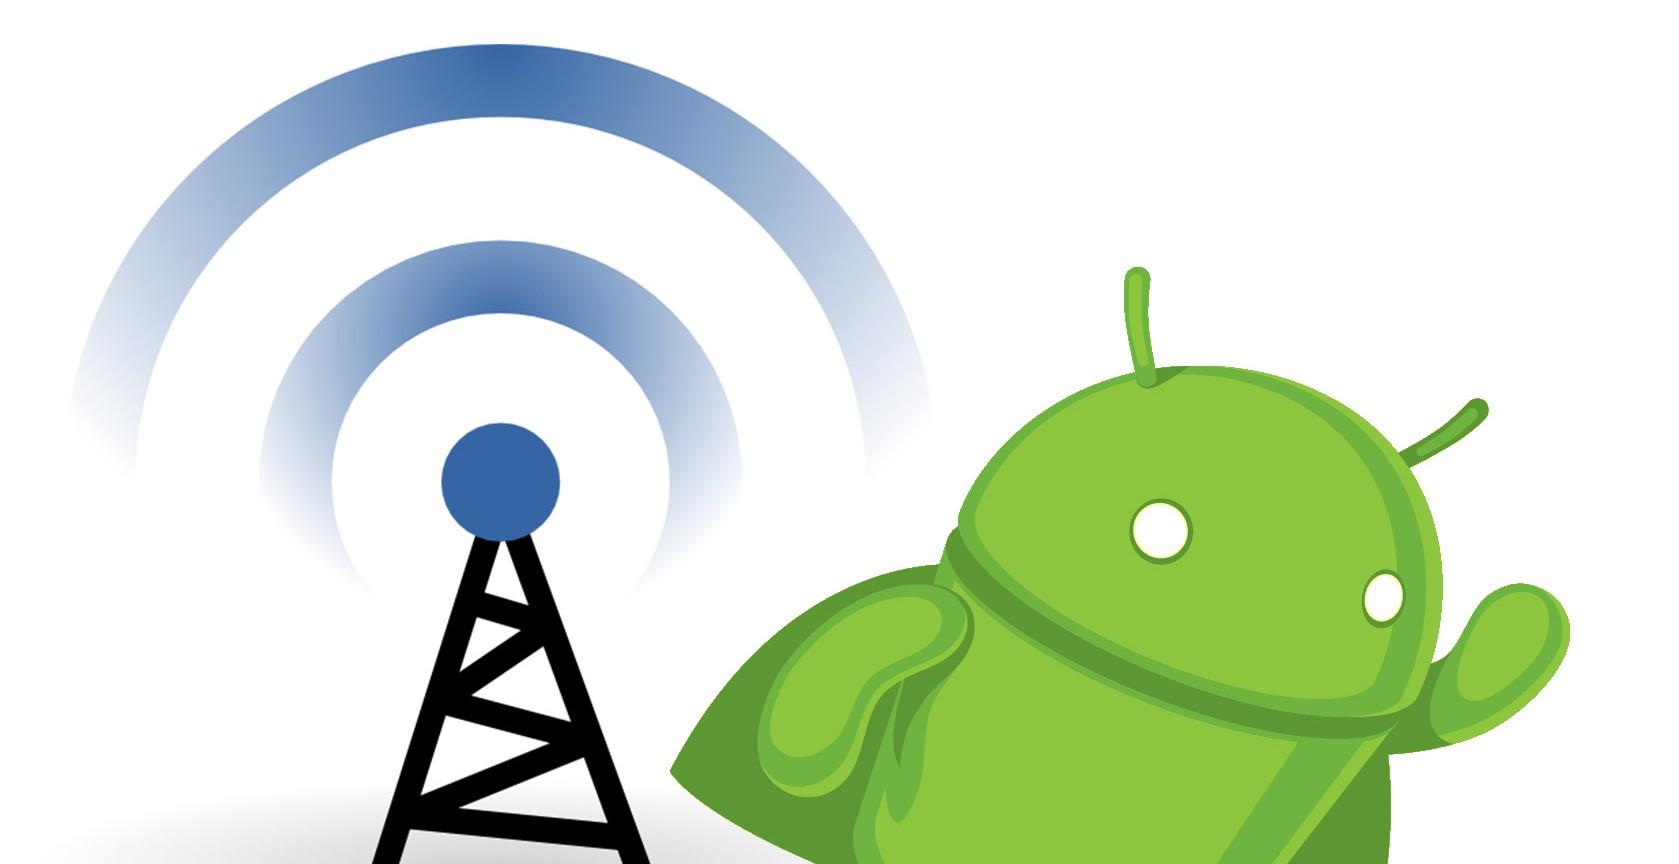 Android-WiFi-antena-e1422381417139